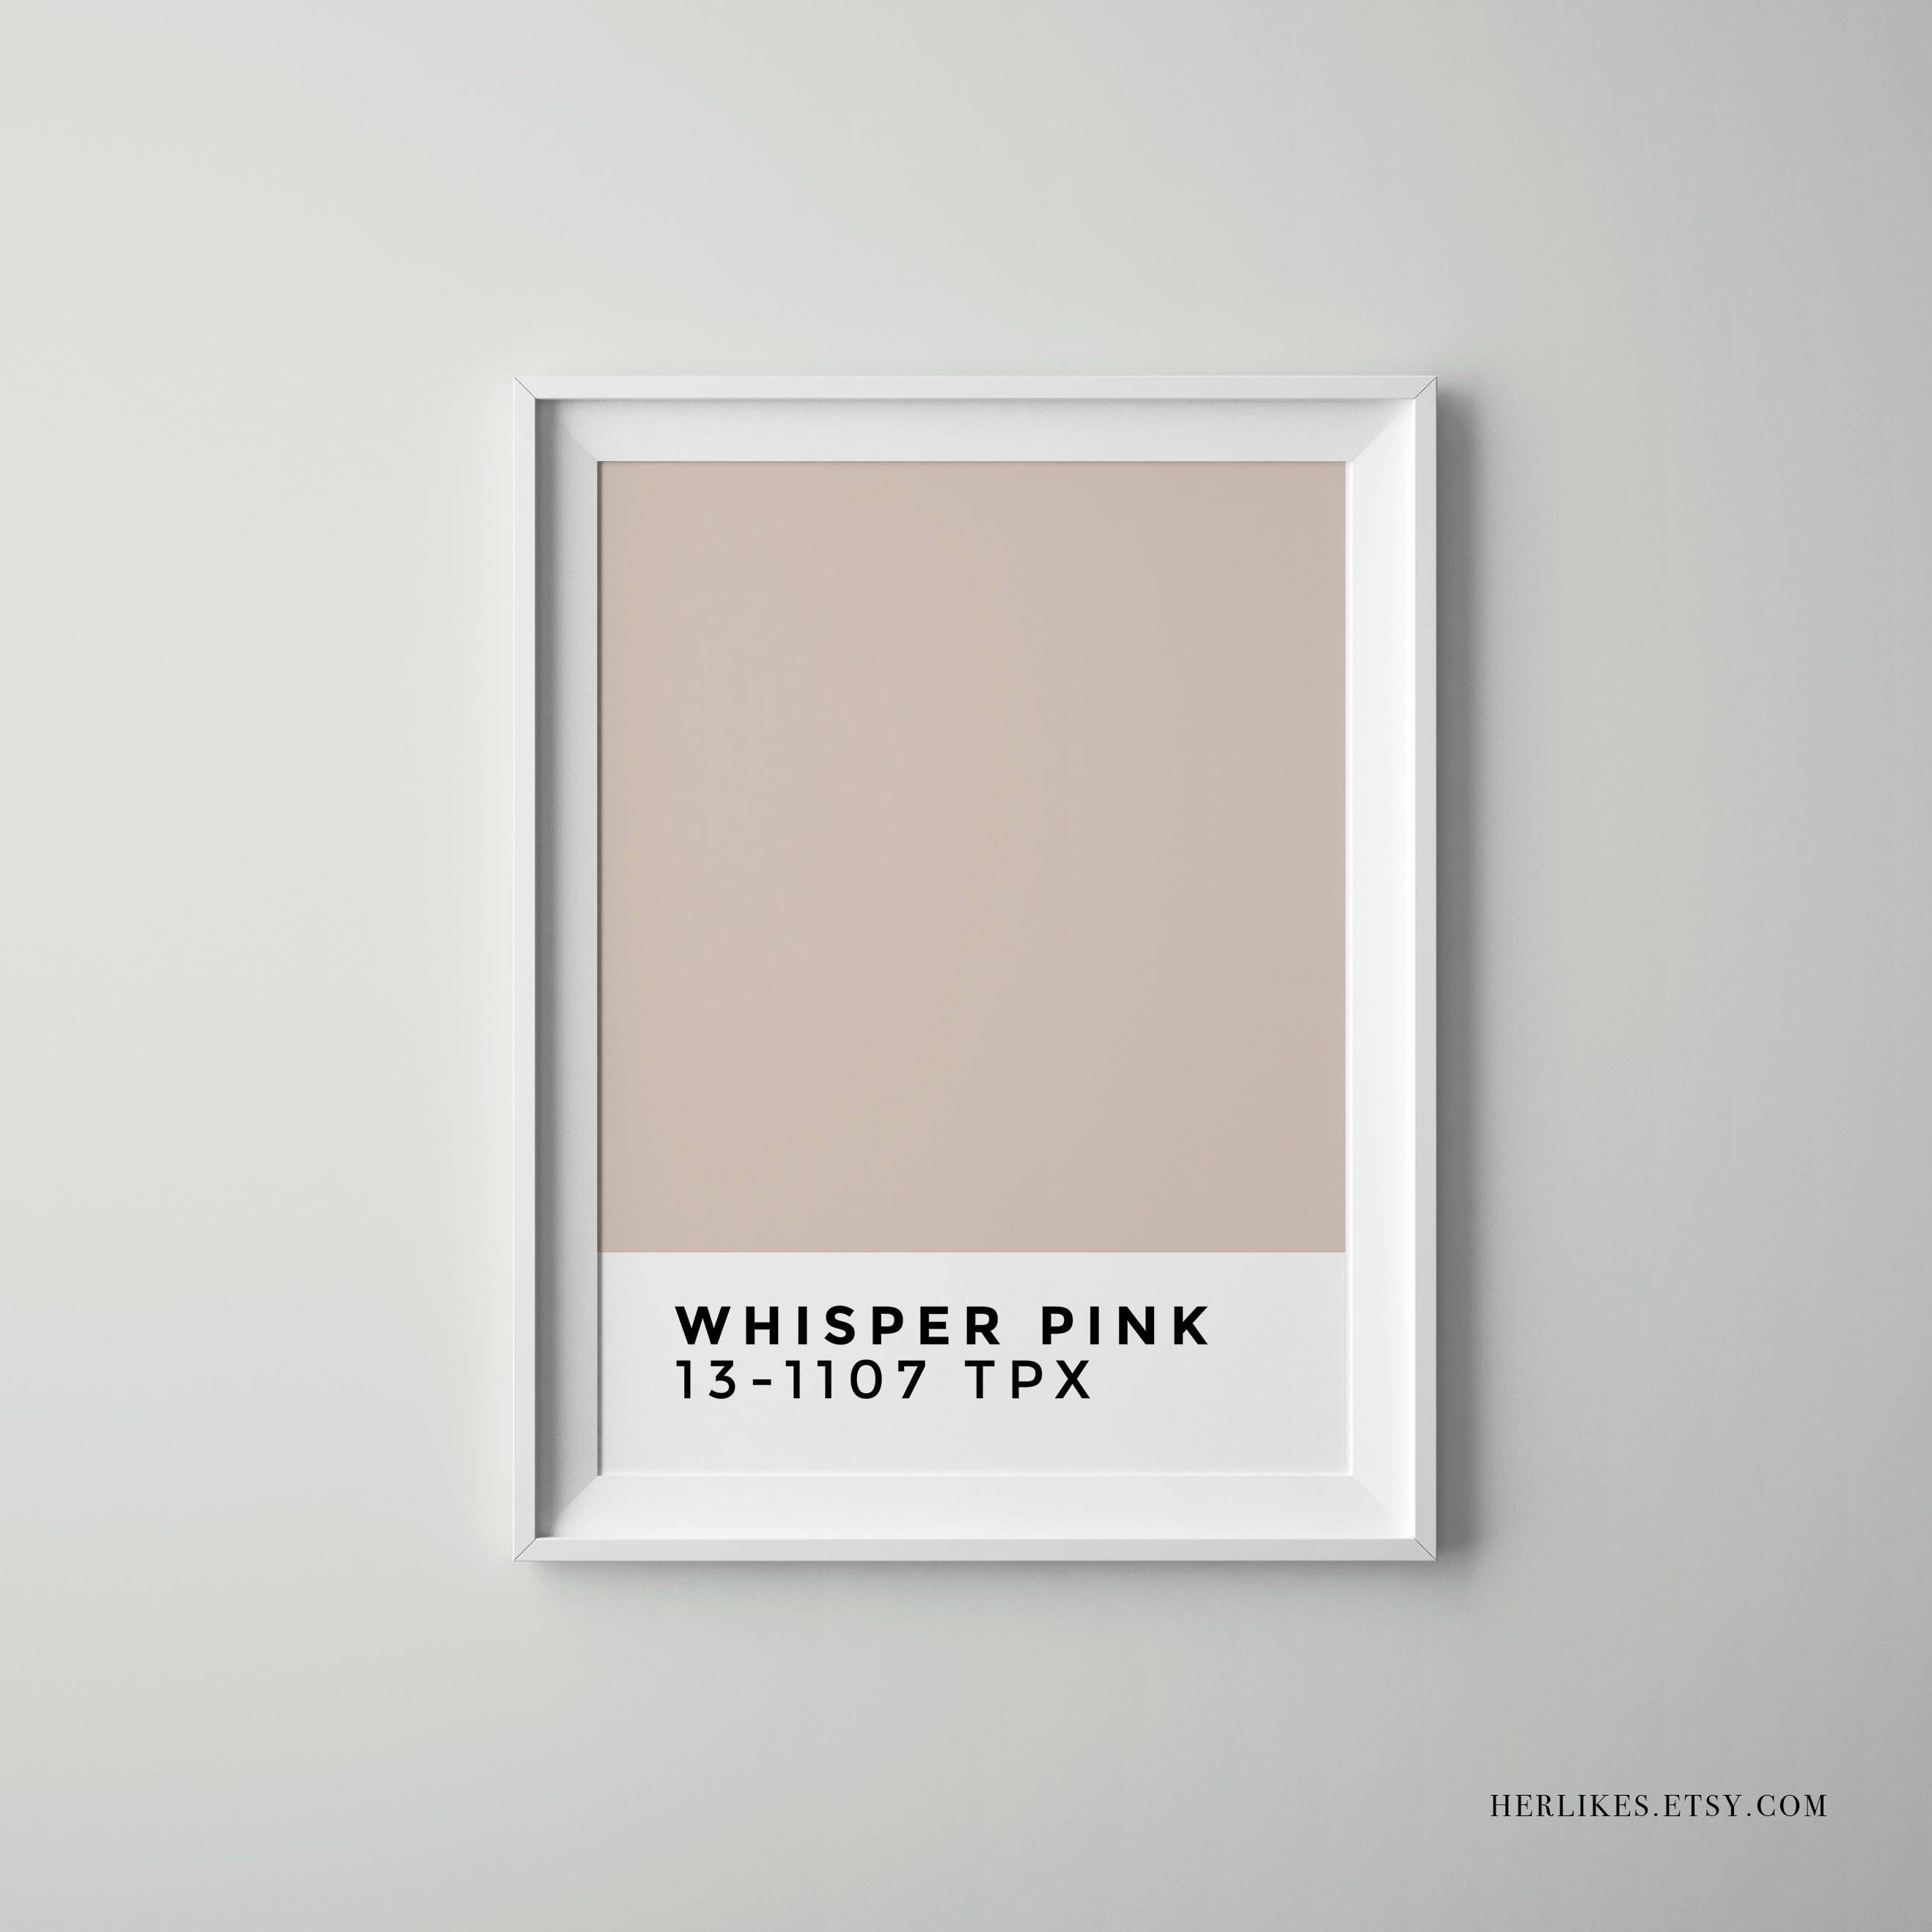 Tumblr Room Decor Shop.I Am Deliberate Minimalist Poster Fashion Poster